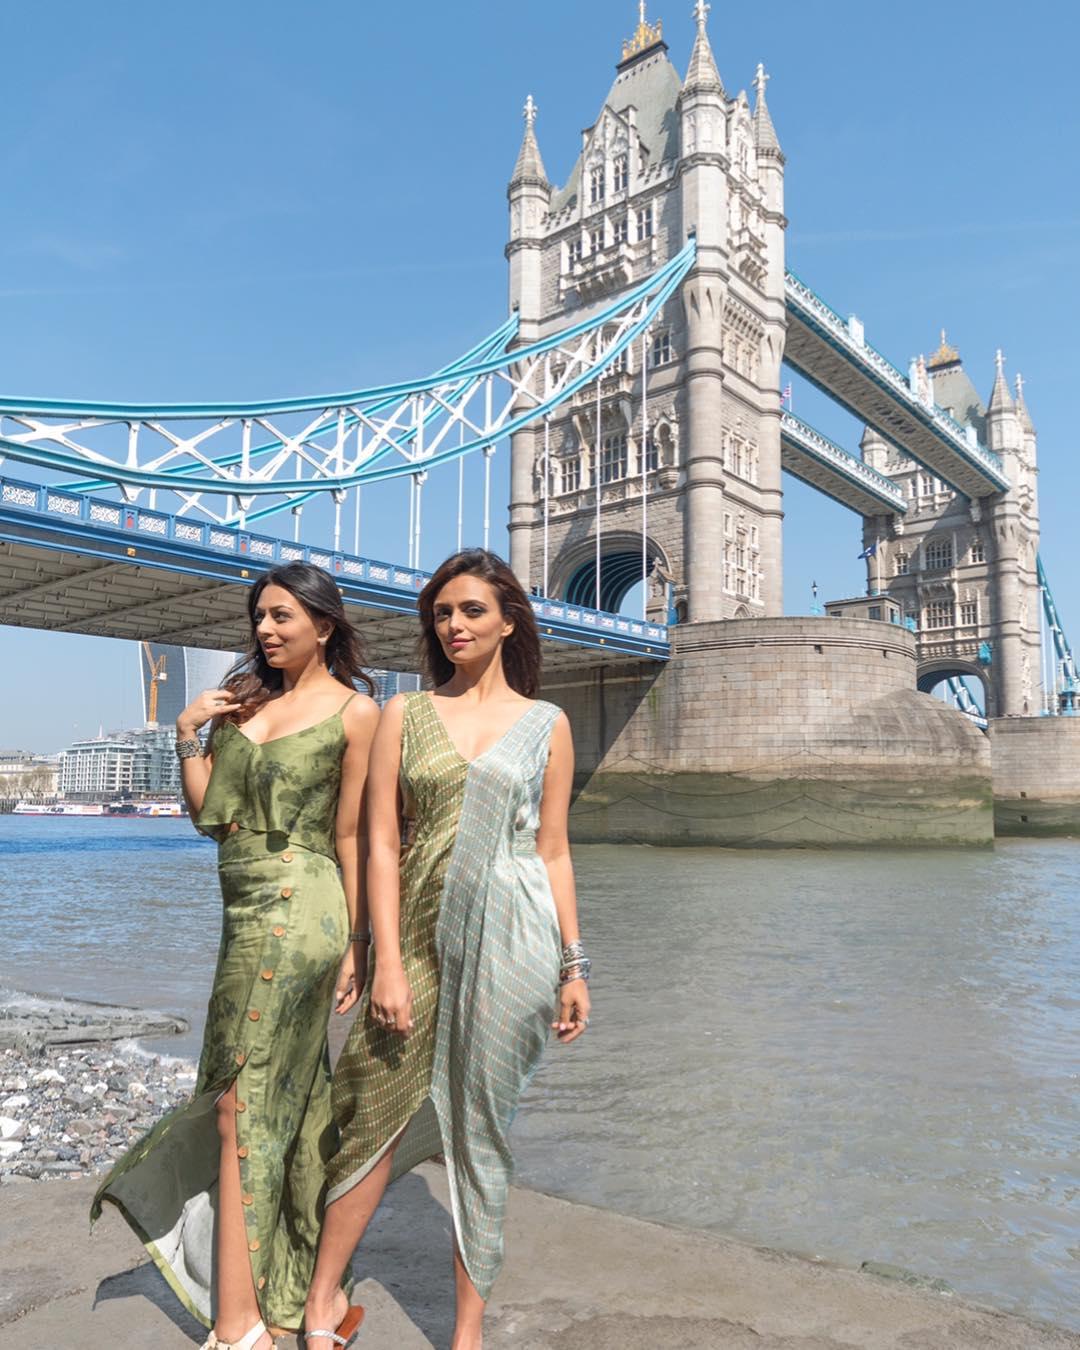 Roshni Chopra Design Indian Fashion Blog London Uk The Red Notebook Blog Indian Fashion Blogger London Asian Fashion Lifestyle Blog Uk